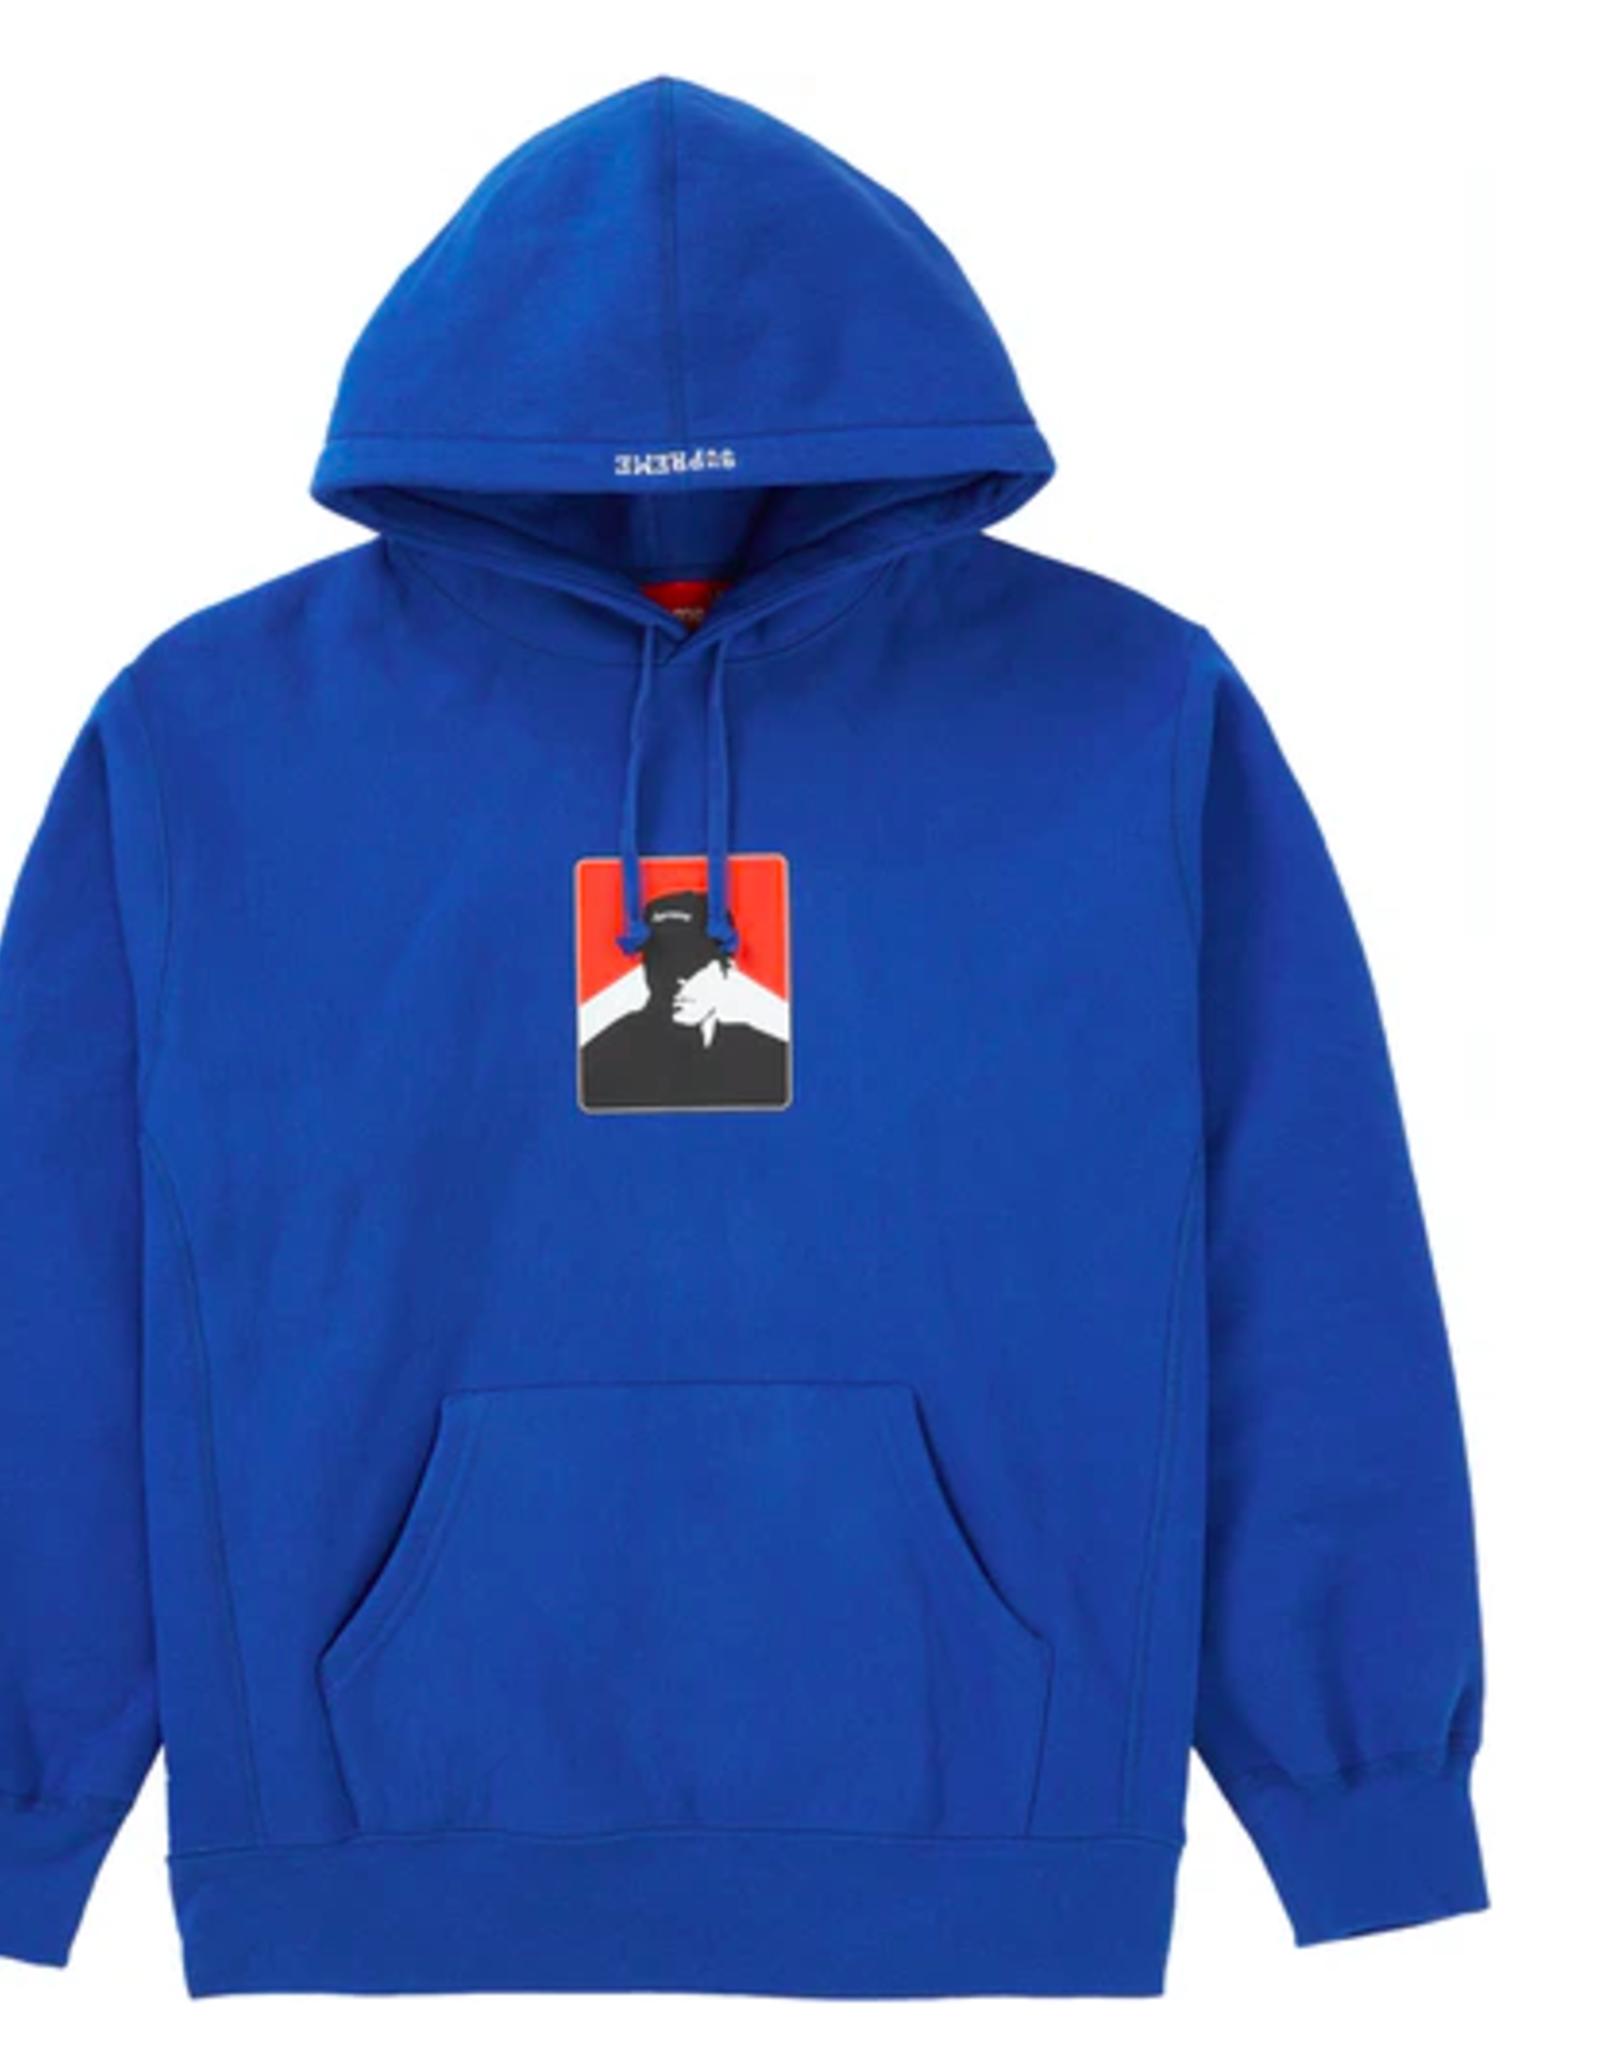 SUPREME Supreme Portrait Hooded Sweatshirt (FW20) Royal LG